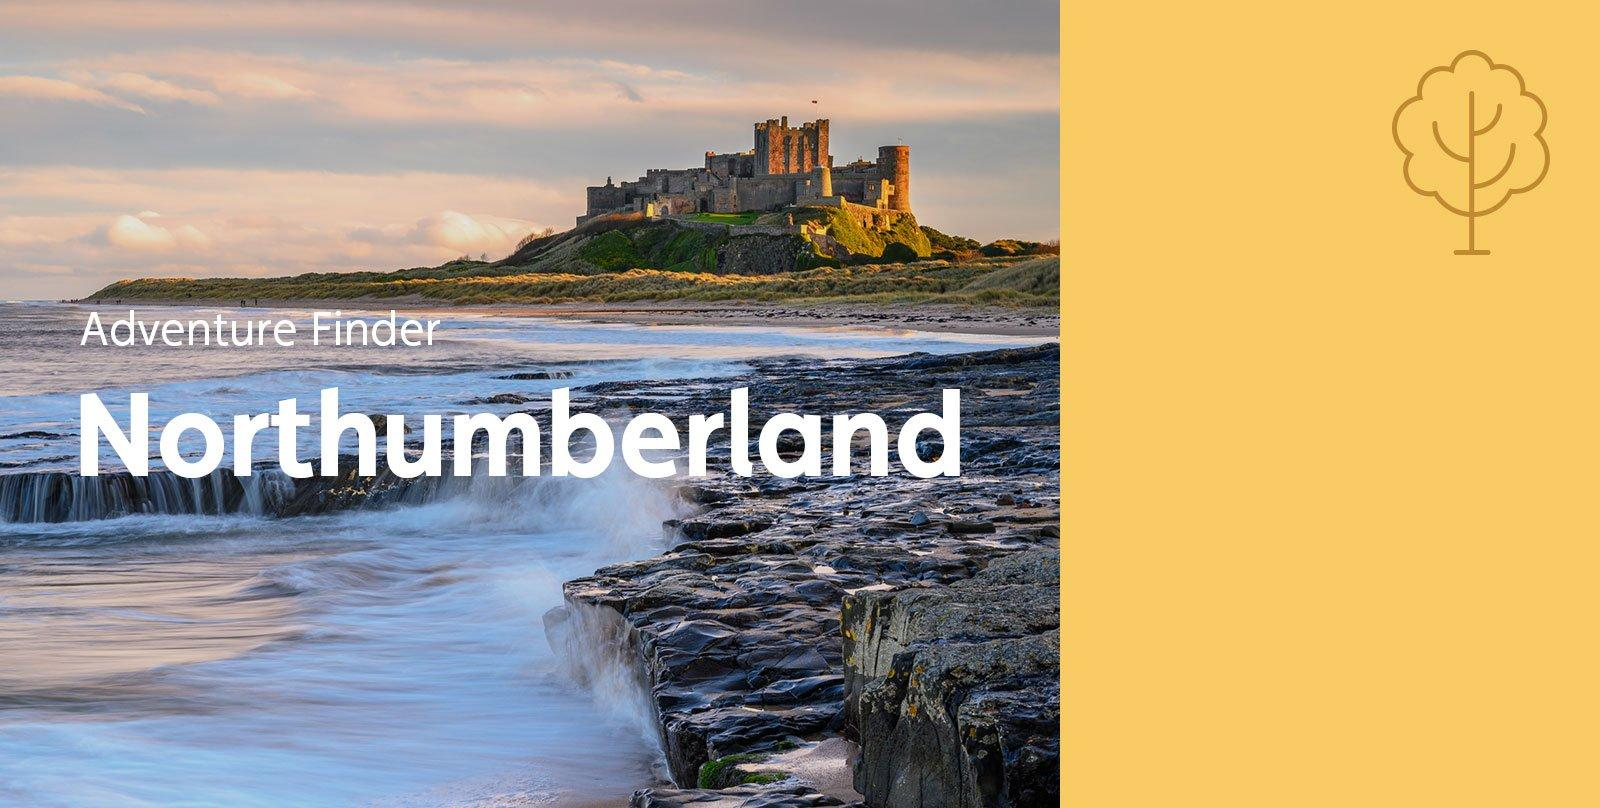 Northumberland Adventure Finder